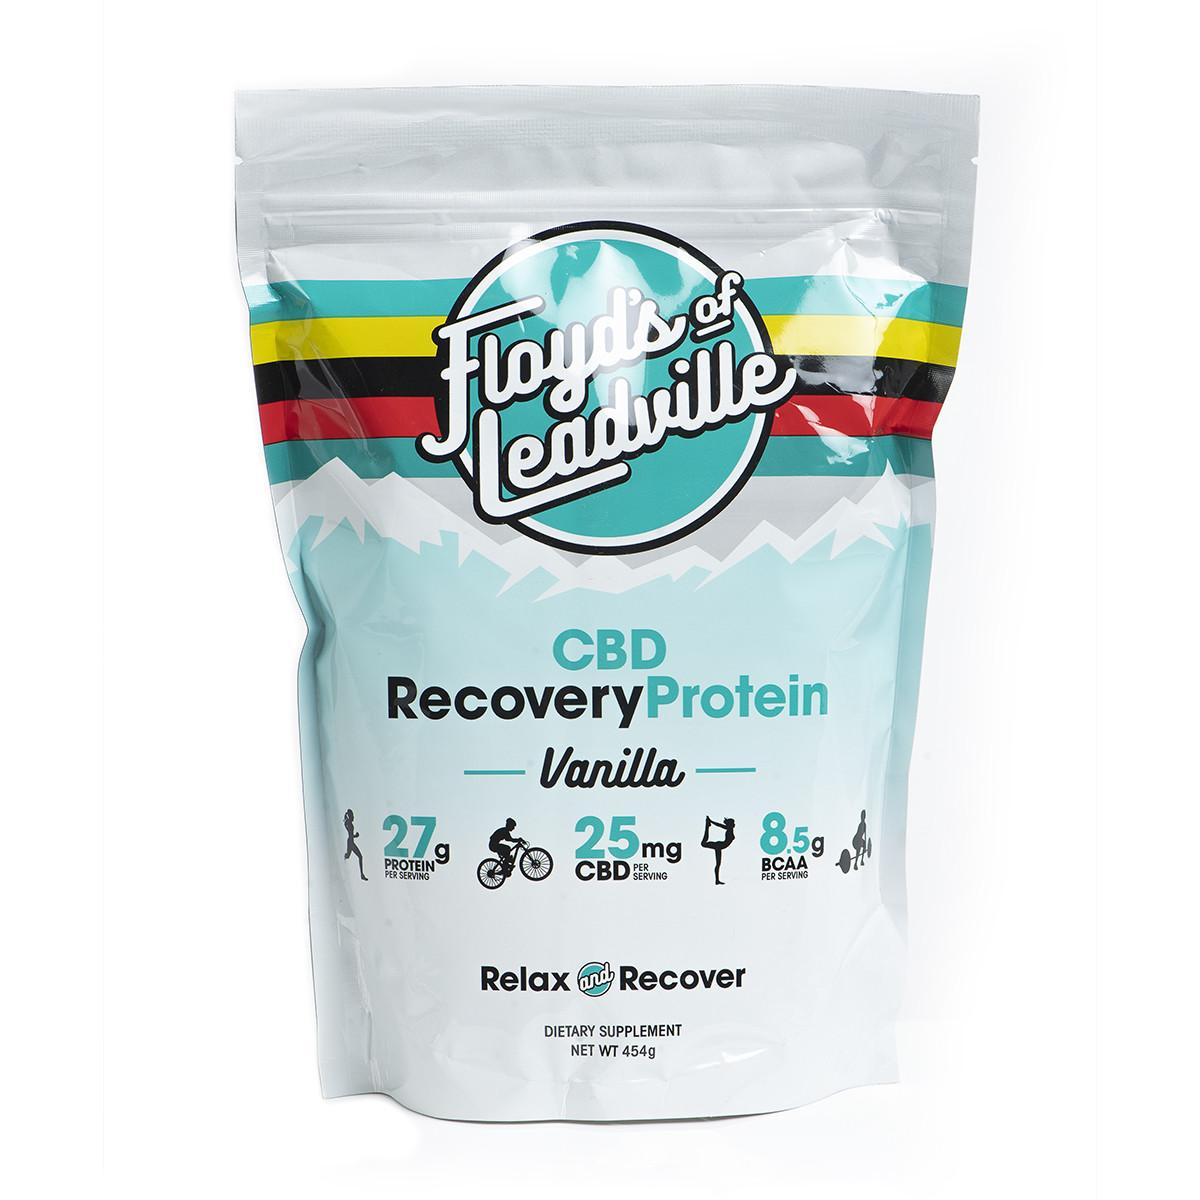 Floyd of Leadville CBD Protein Powder - Vanilla